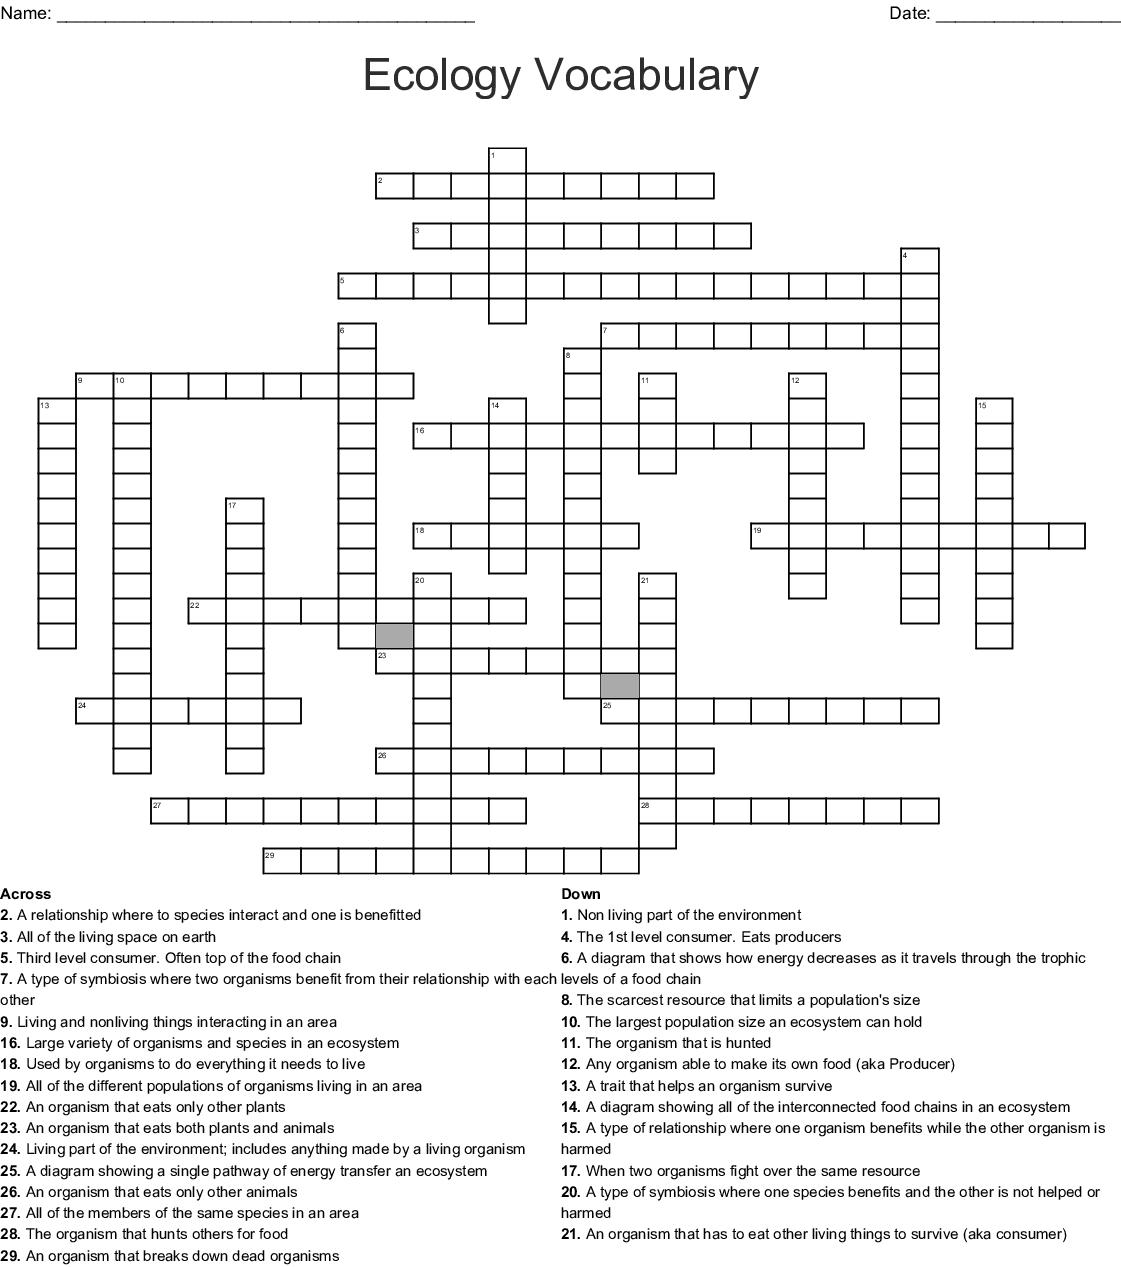 Ecology Vocabulary Crossword